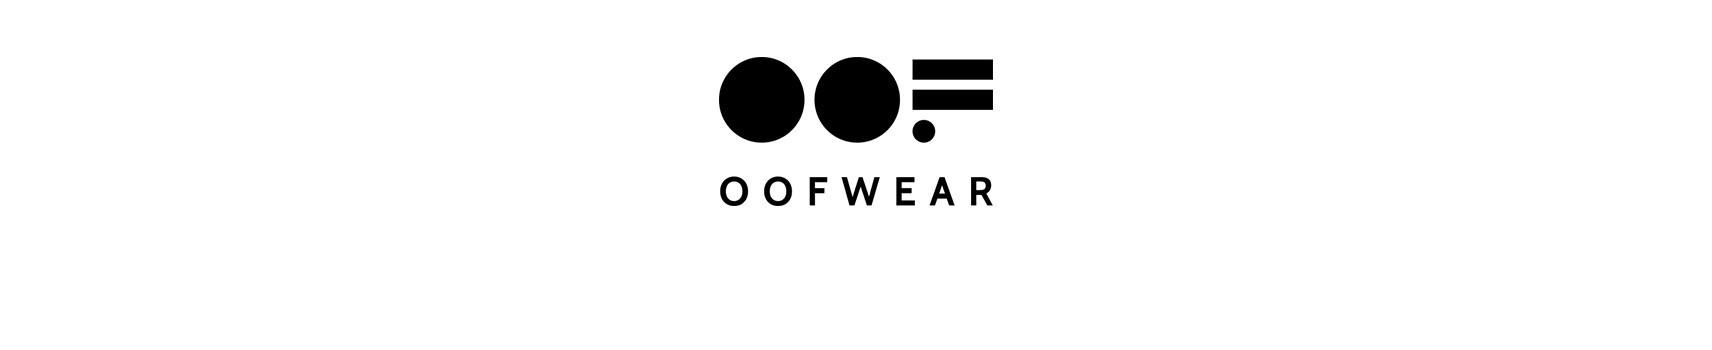 OOFWEAR